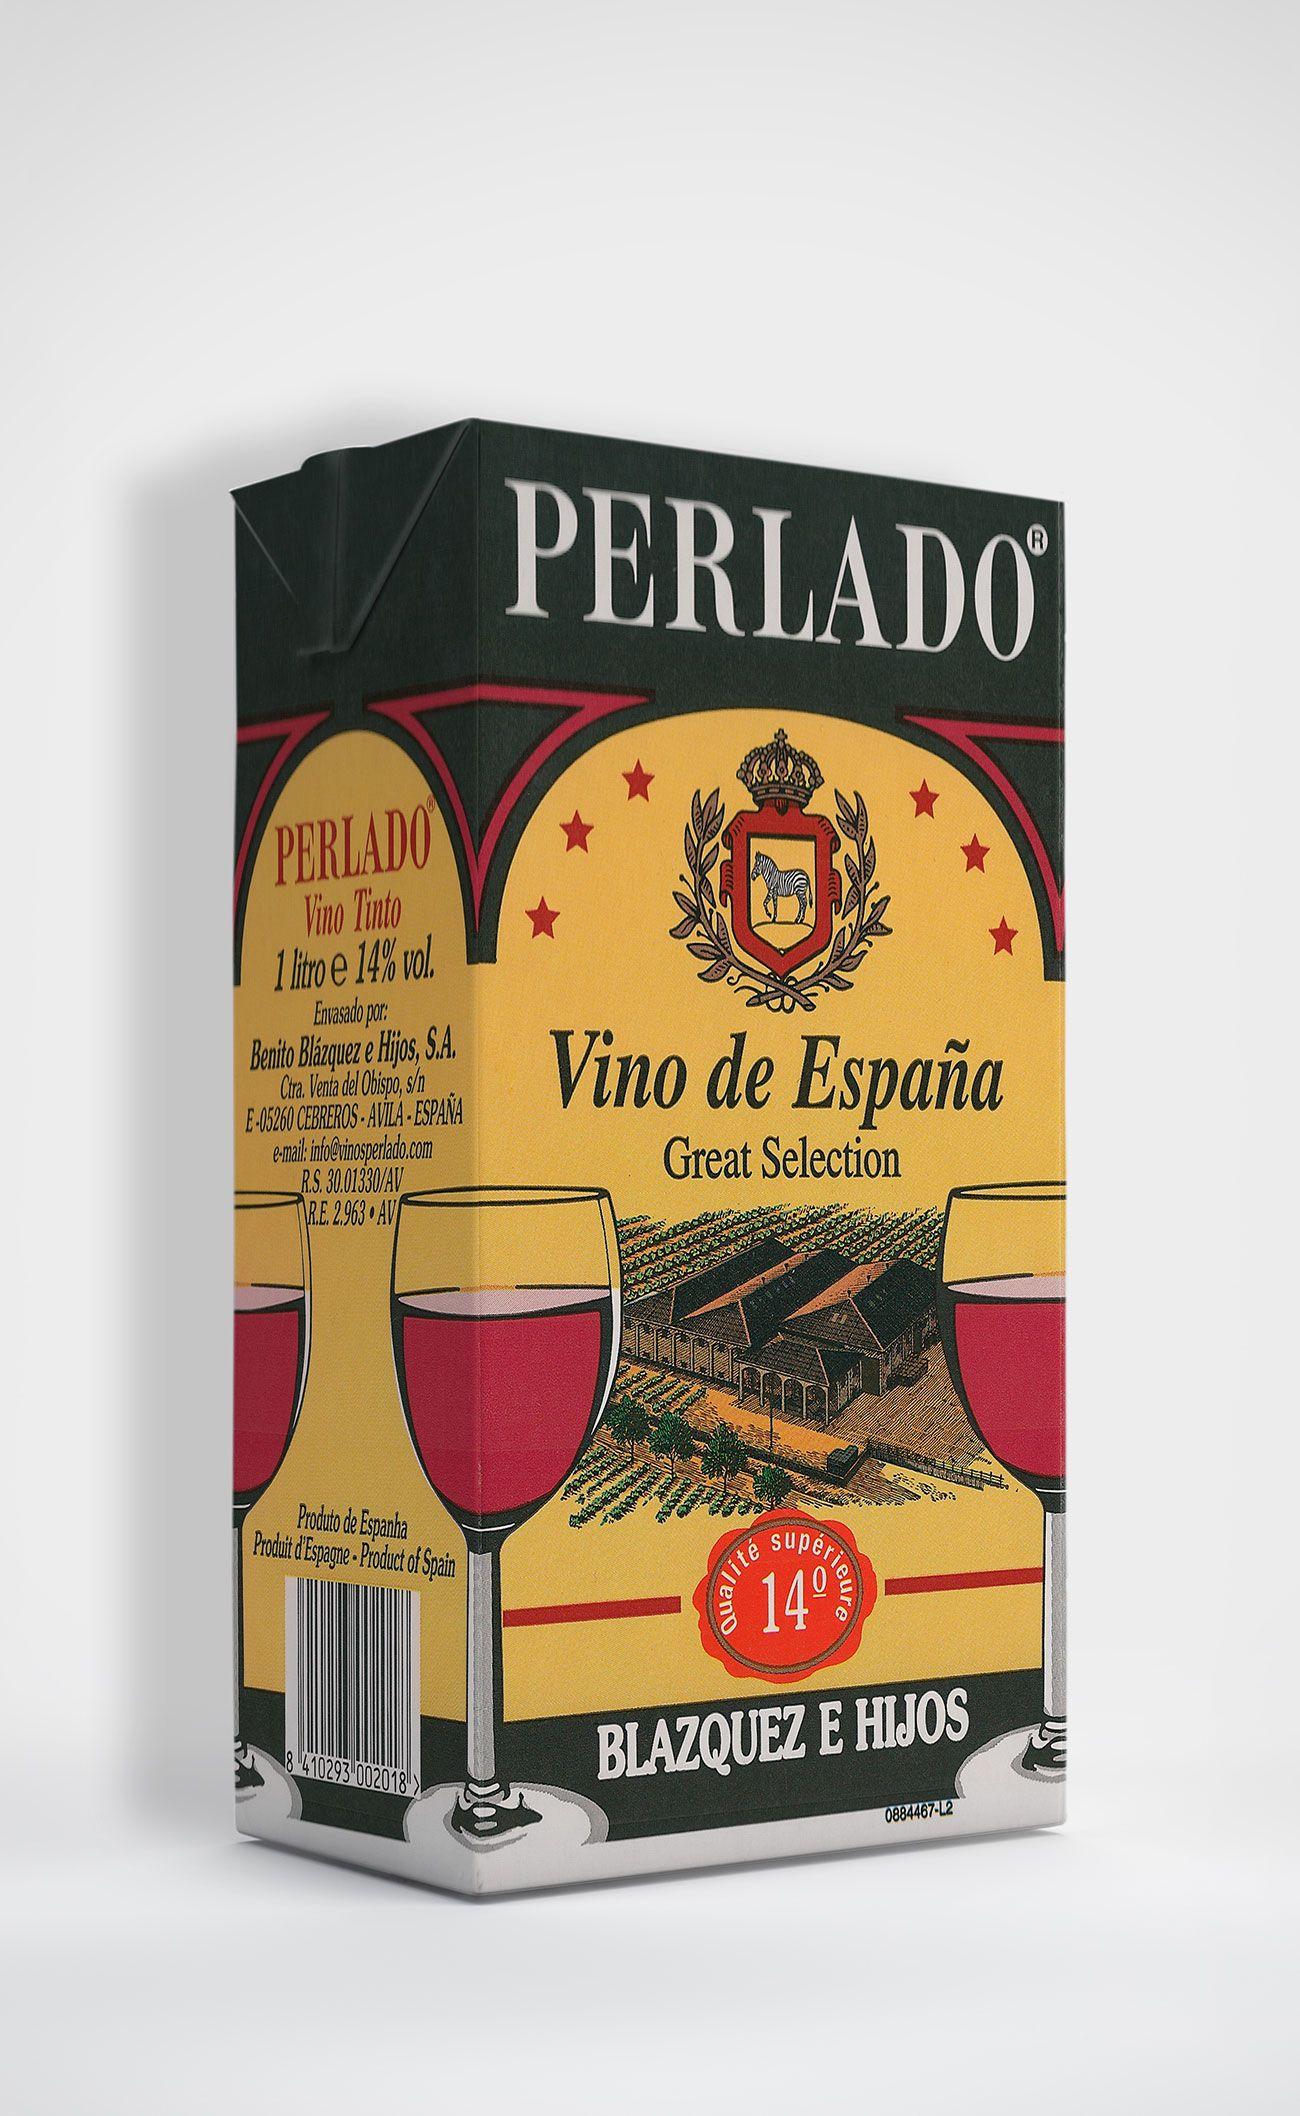 Benito Blázquez - Brik de Vino Perlado Tinto